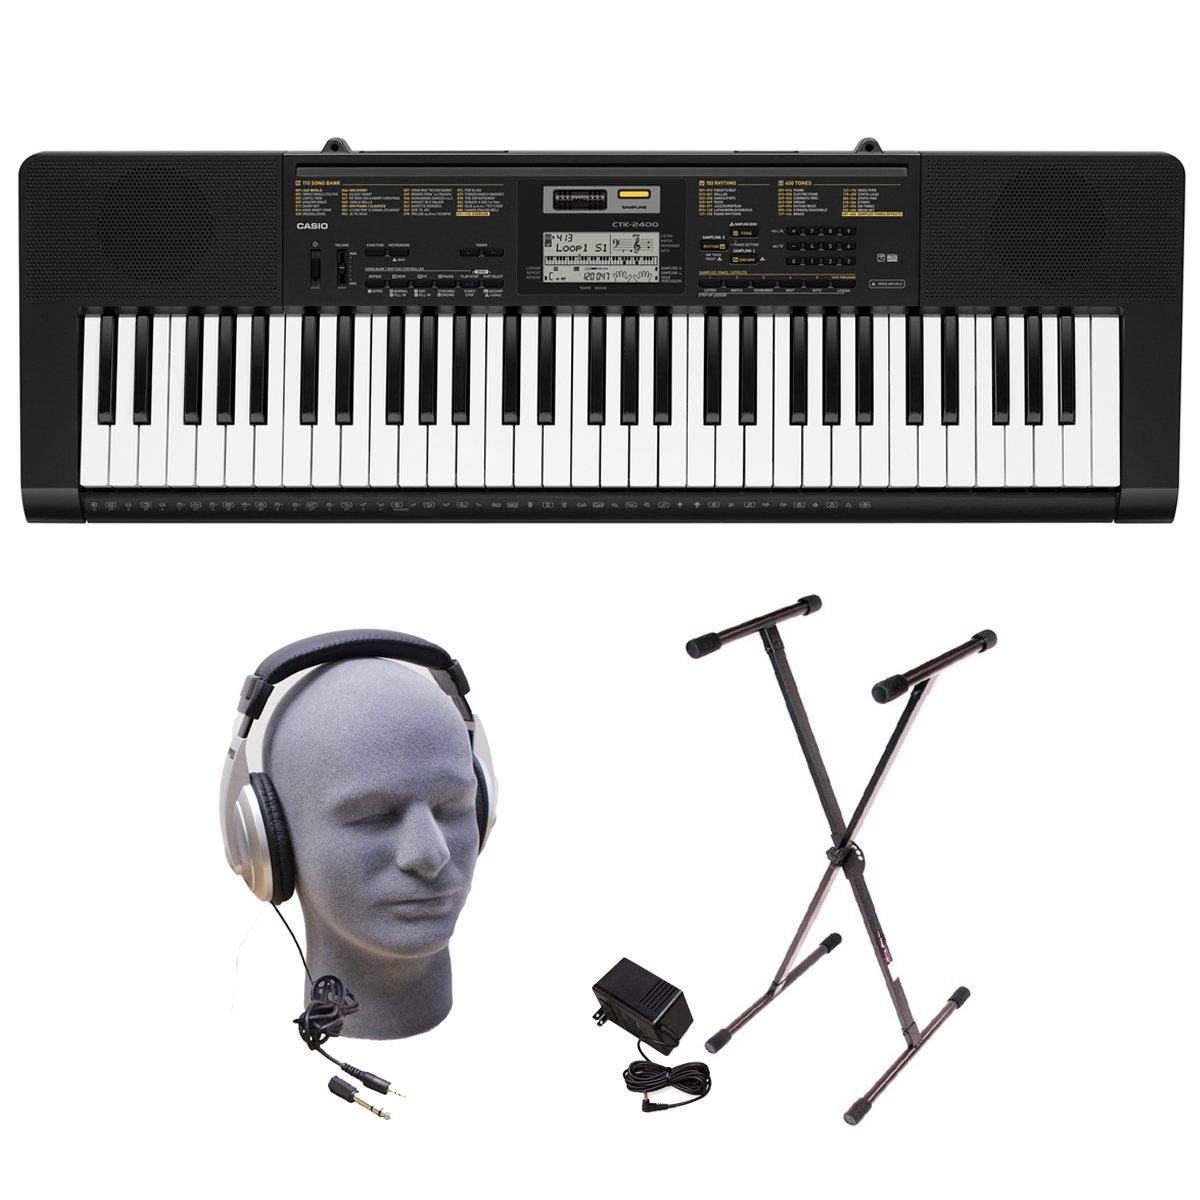 Casio Portable Keyboard piano